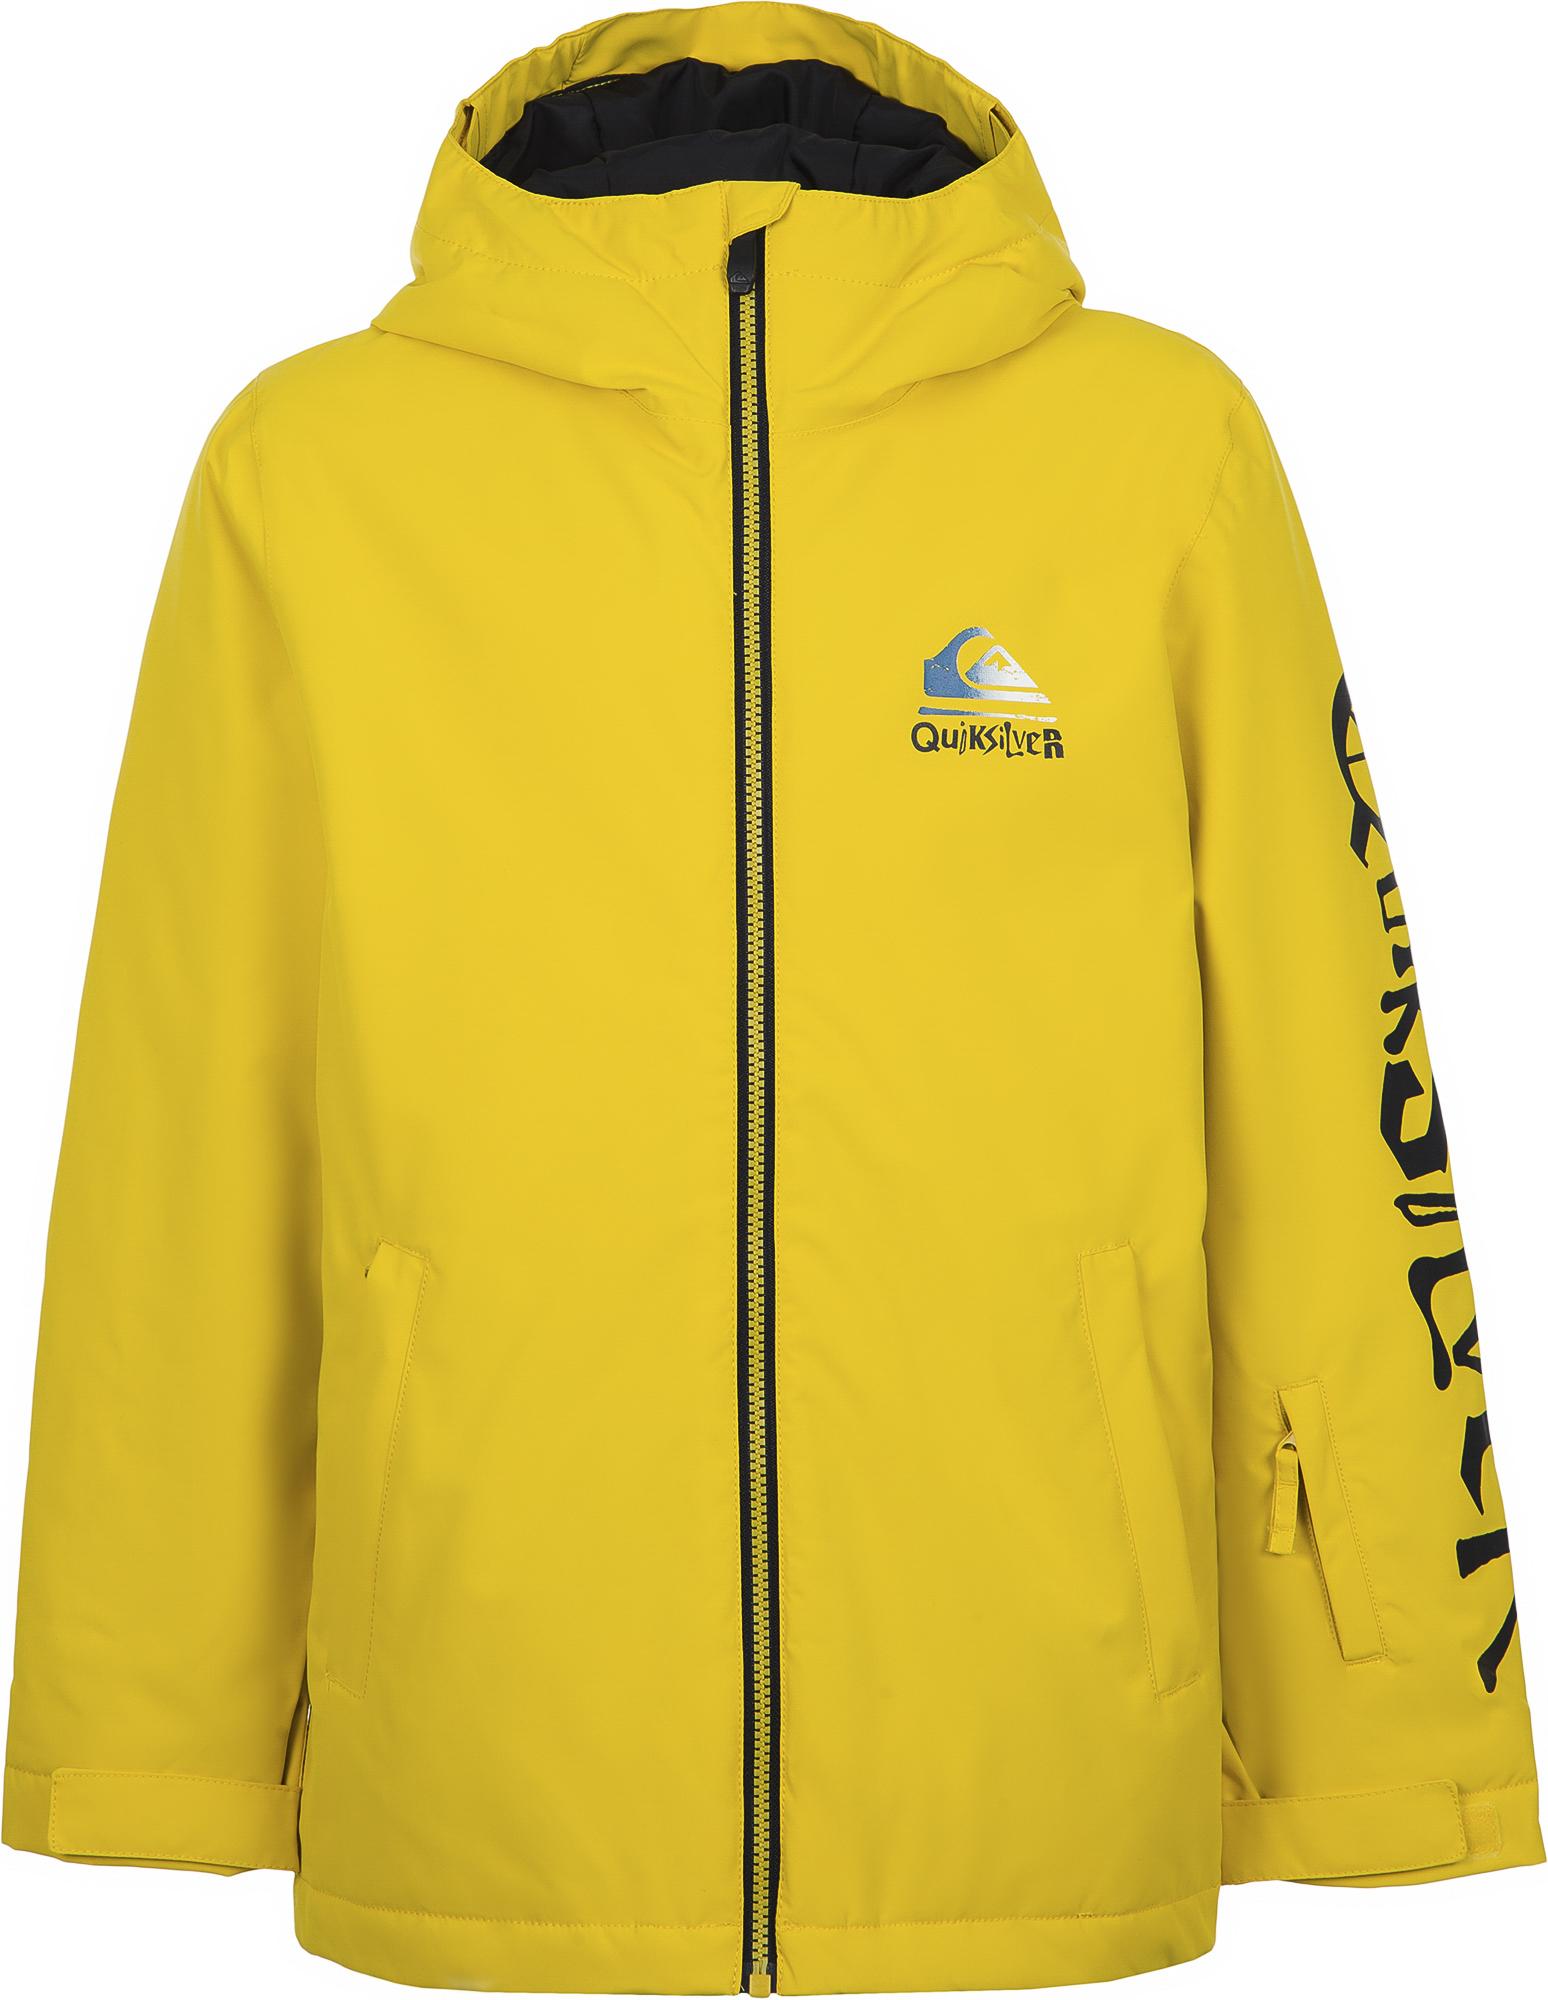 Quiksilver Куртка утепленная для мальчиков In The Hood Youth, размер 164-170